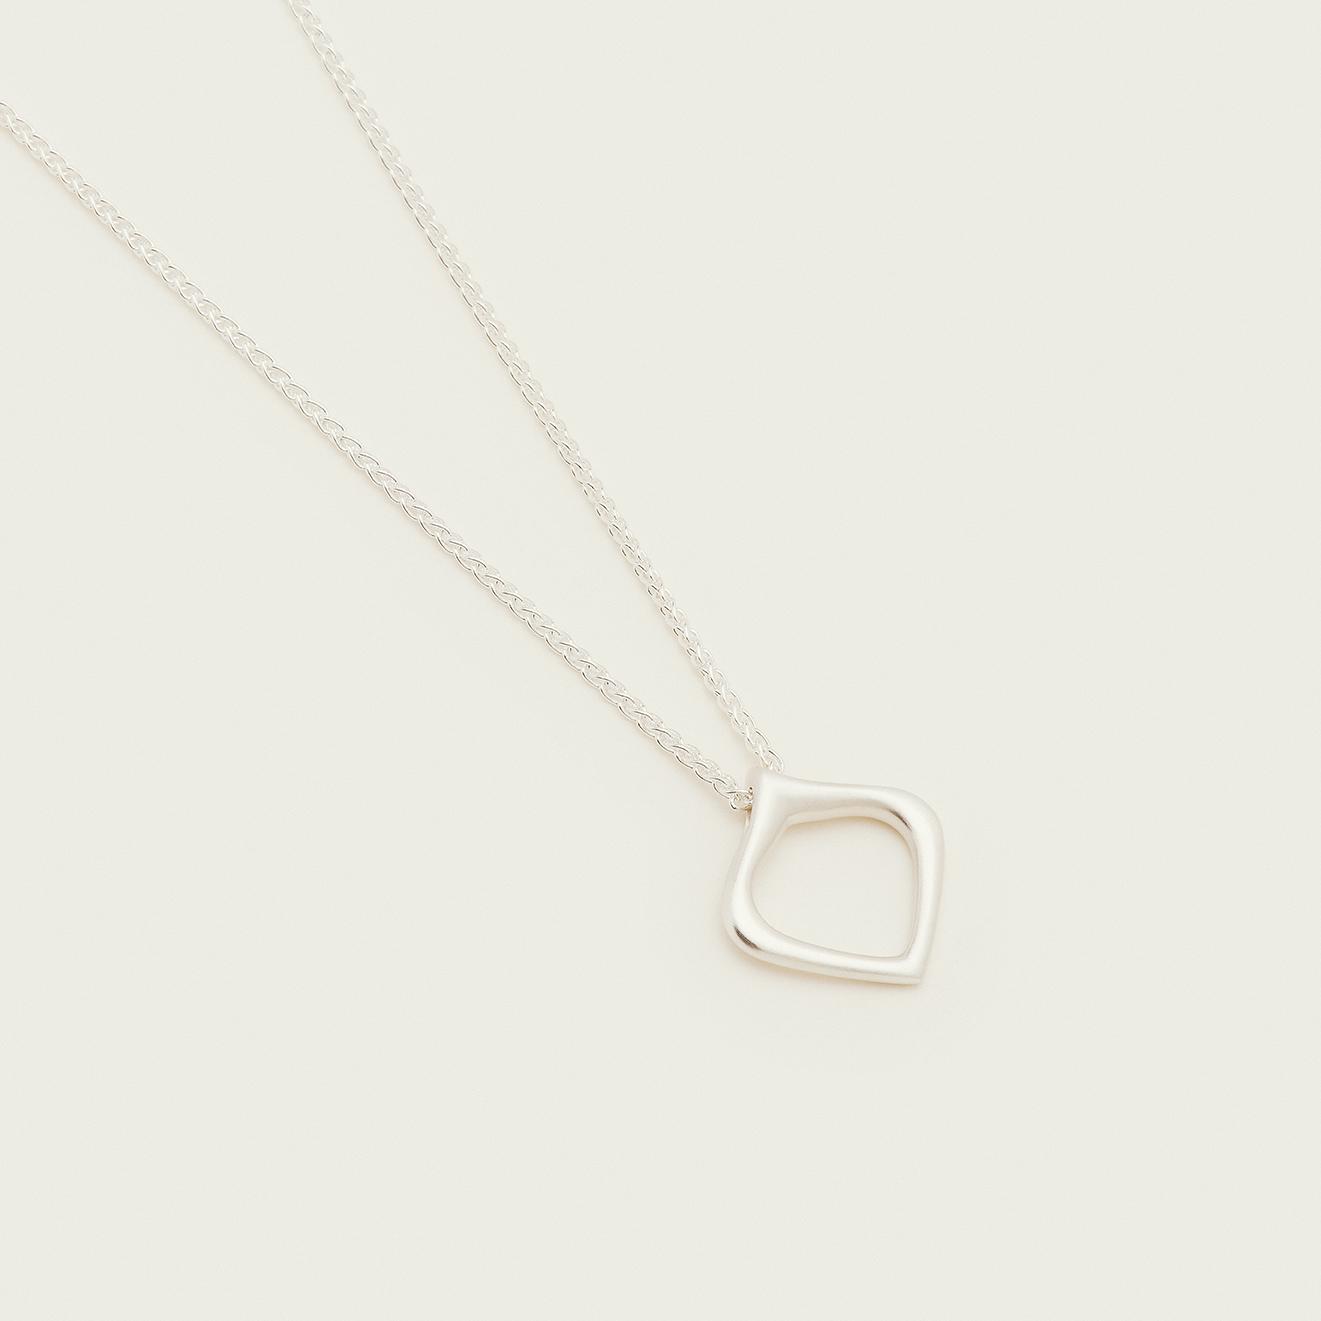 Moznabi Jewellery – Essence of Persia – Silver Pendant